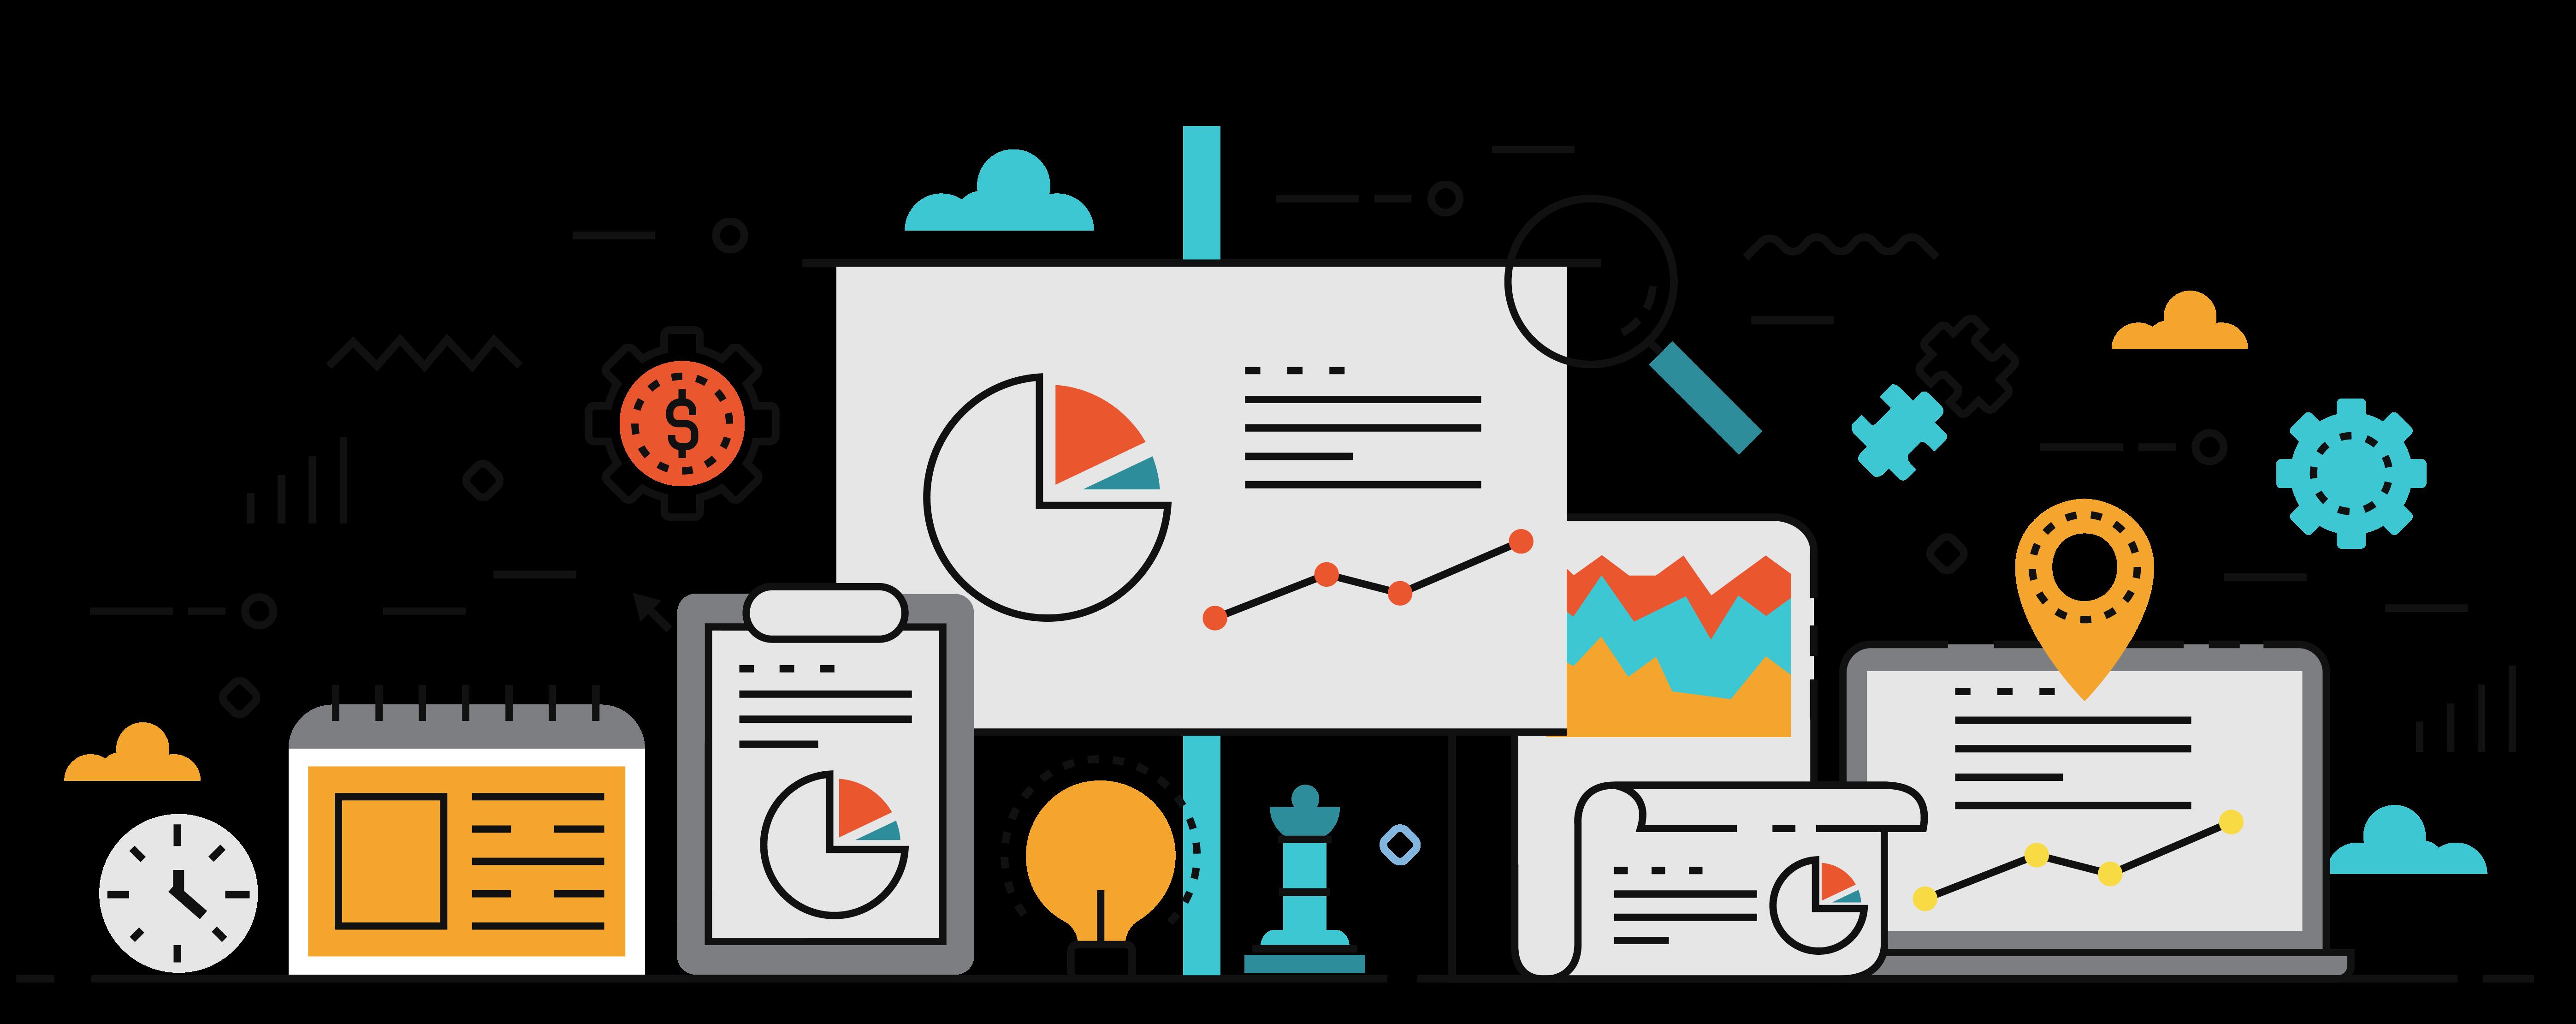 Search Engine Optimisation (SEO) 6 Steps